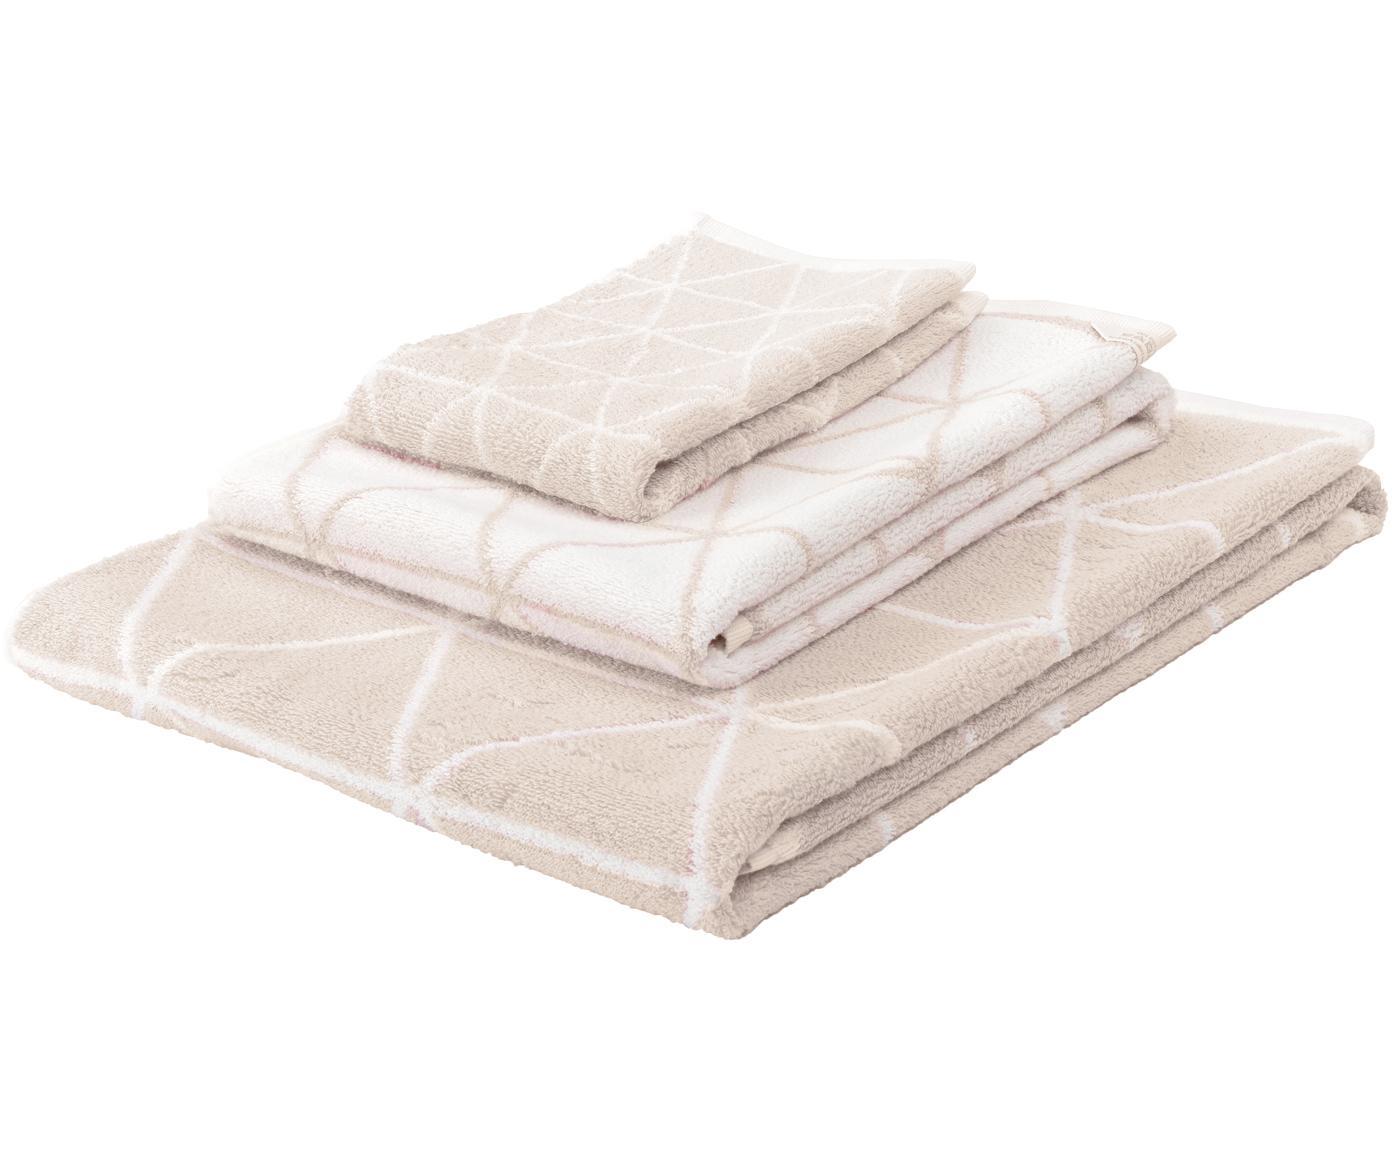 Set 3 asciugamani reversibili Elina, Sabbia, bianco crema, Diverse dimensioni